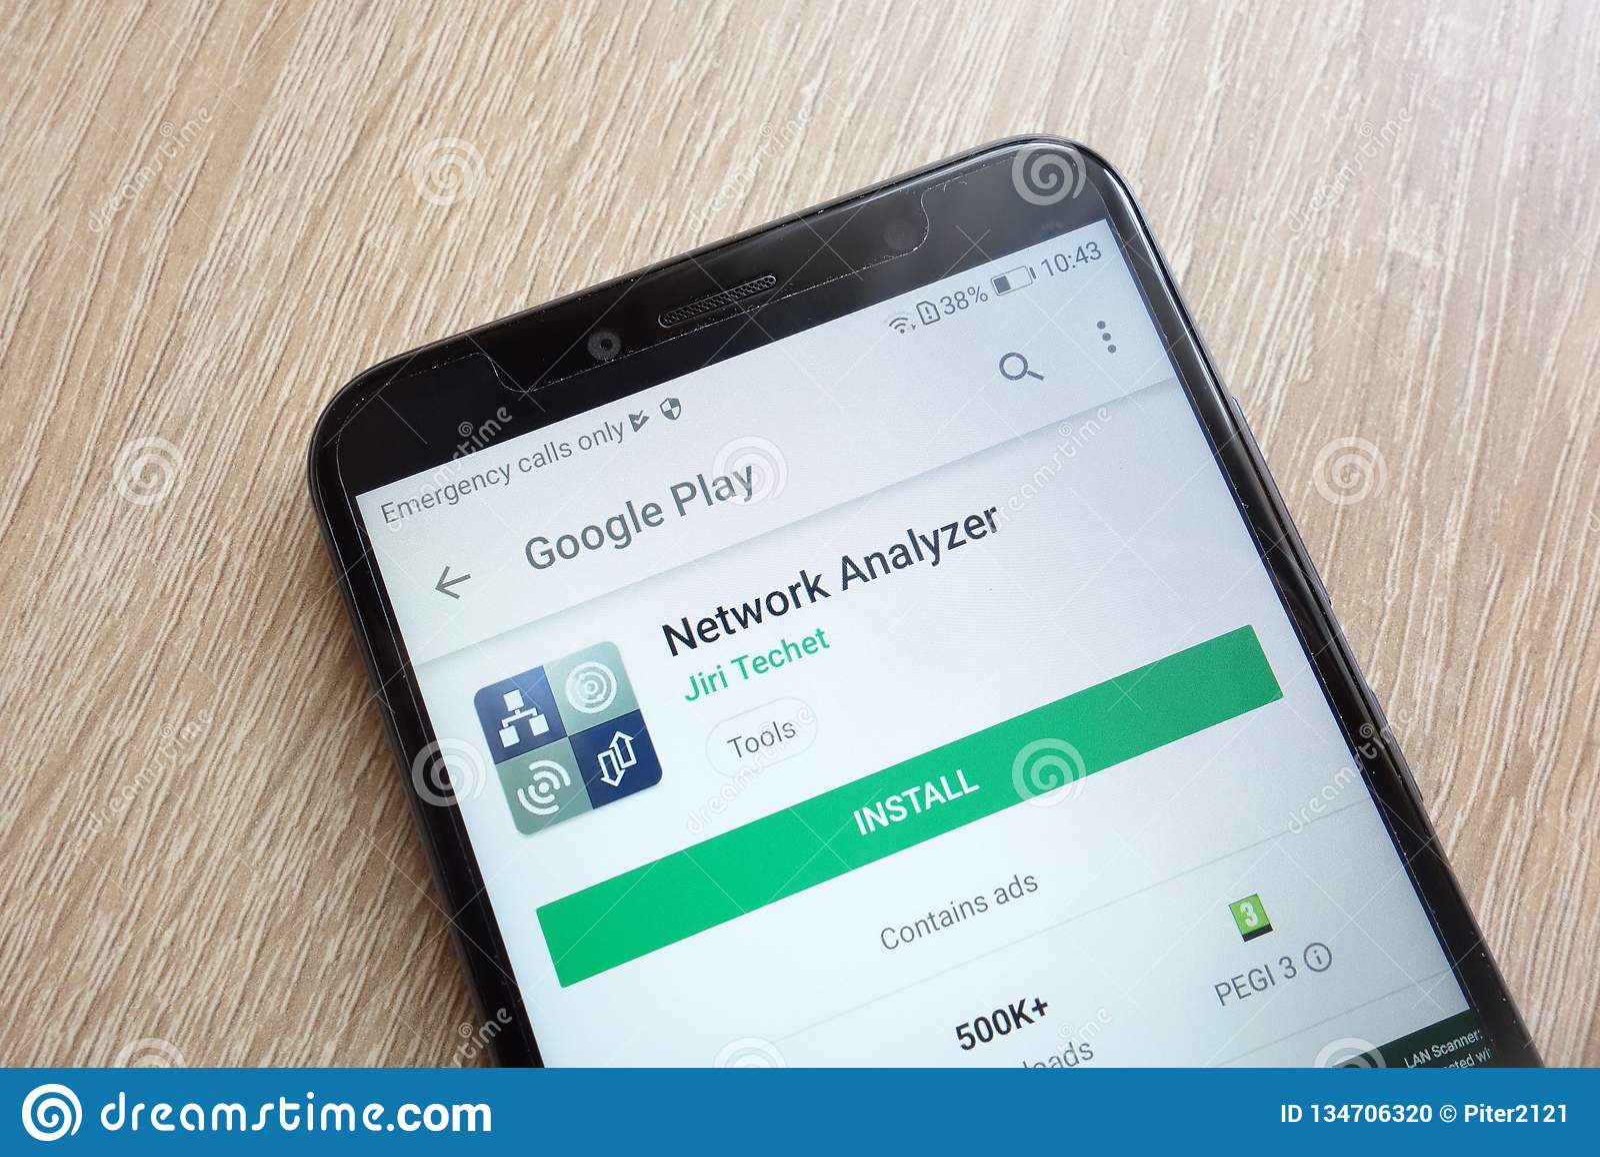 Network Analyzer App On Google Play Store Website Displayed